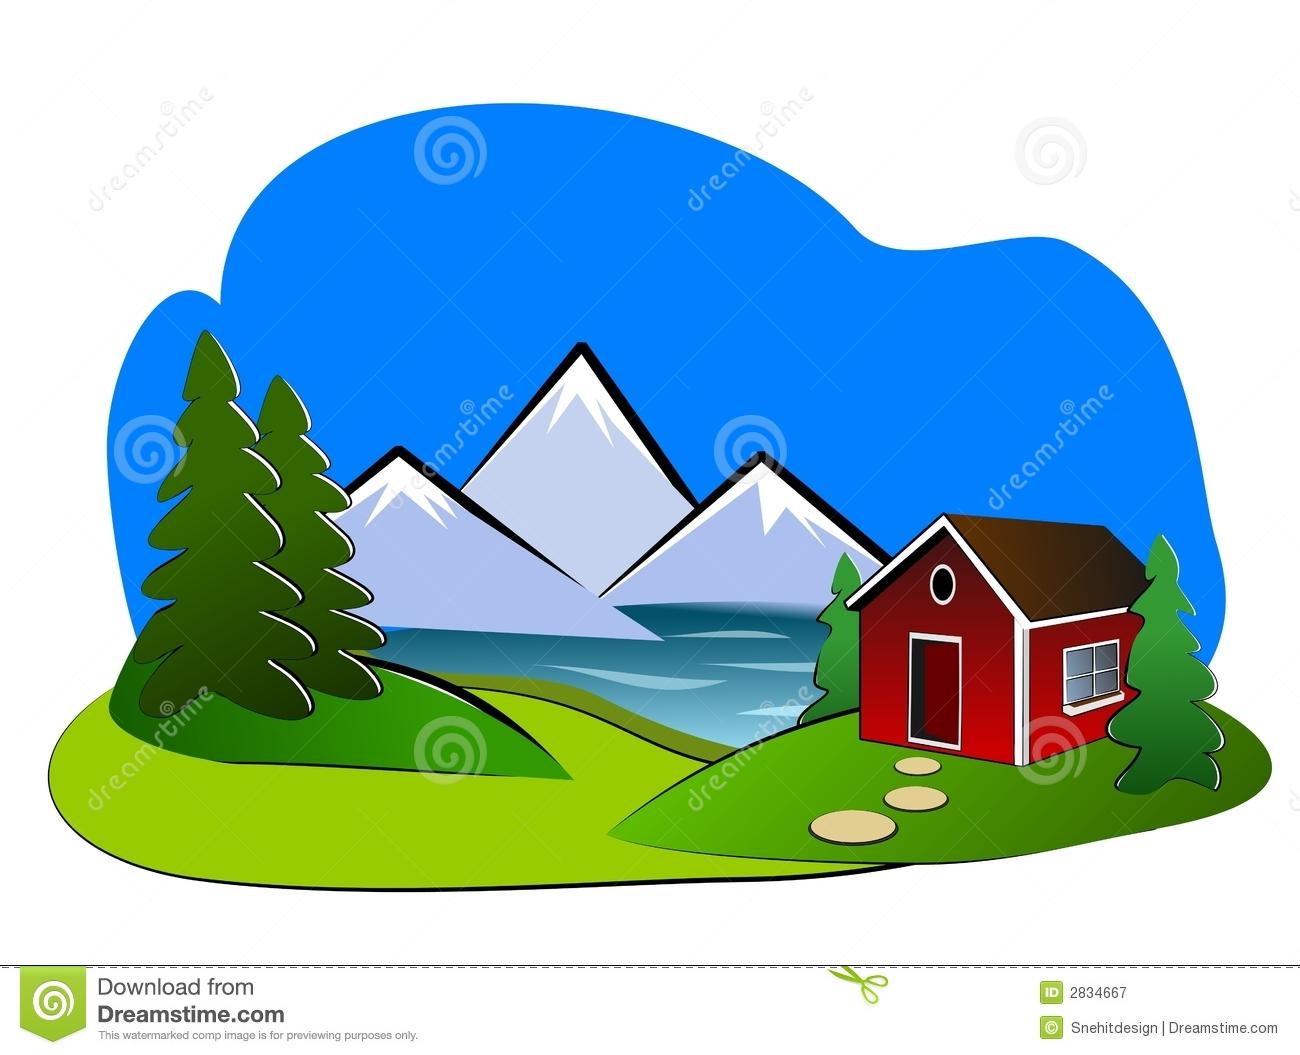 Landscape clipart #4, Download drawings